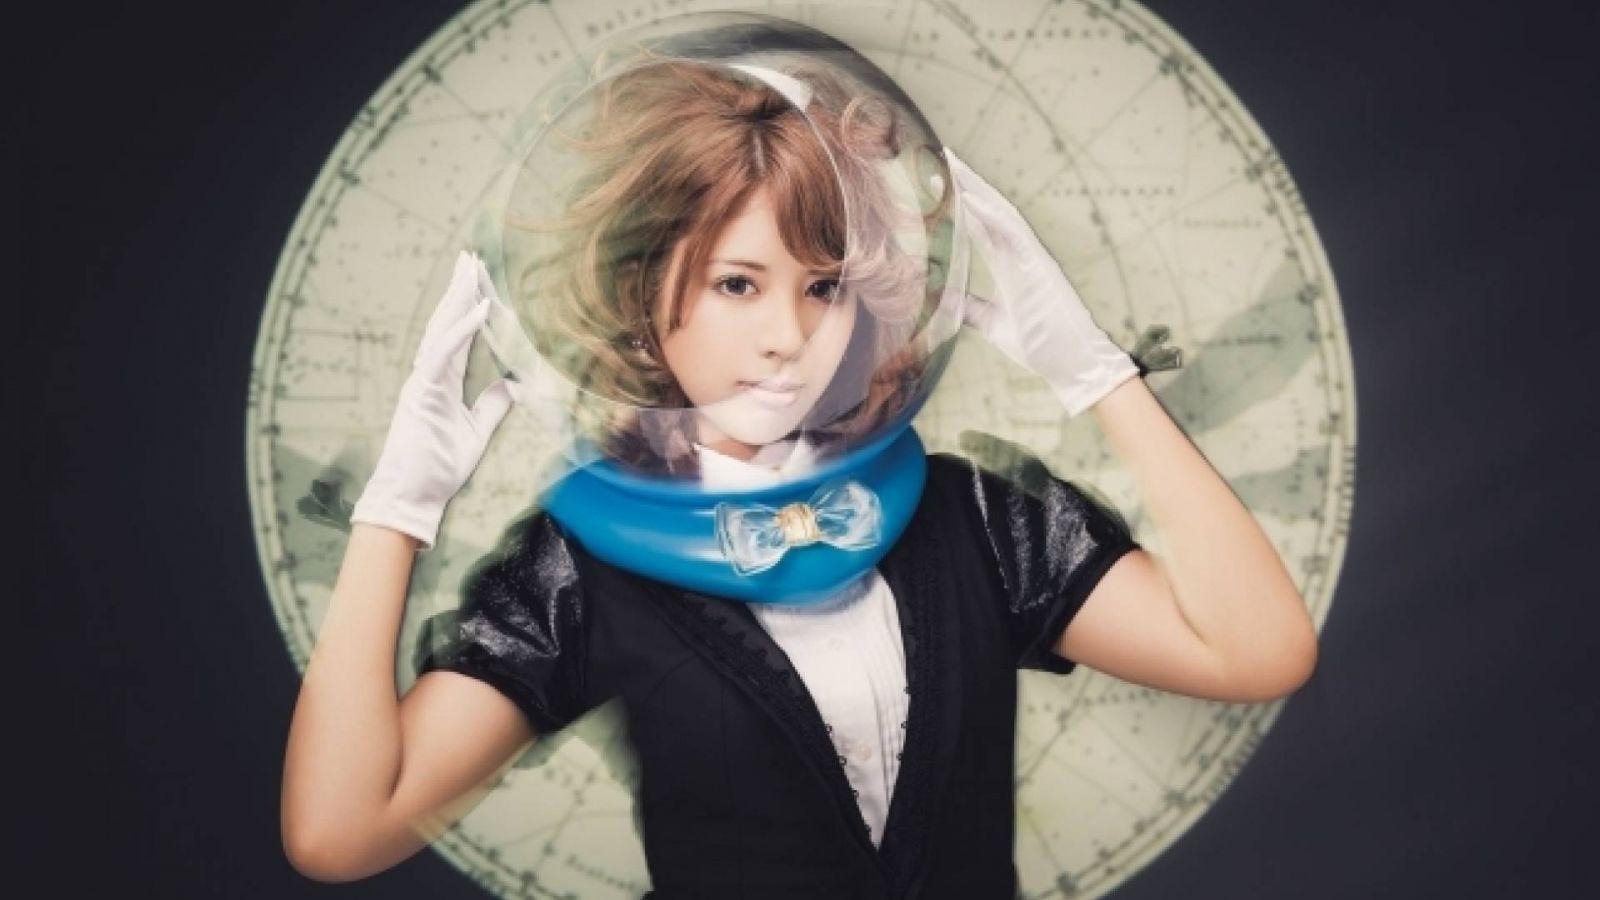 killy killy JOKER é o novo single de Kanon Wakeshima © Kanon Wakeshima